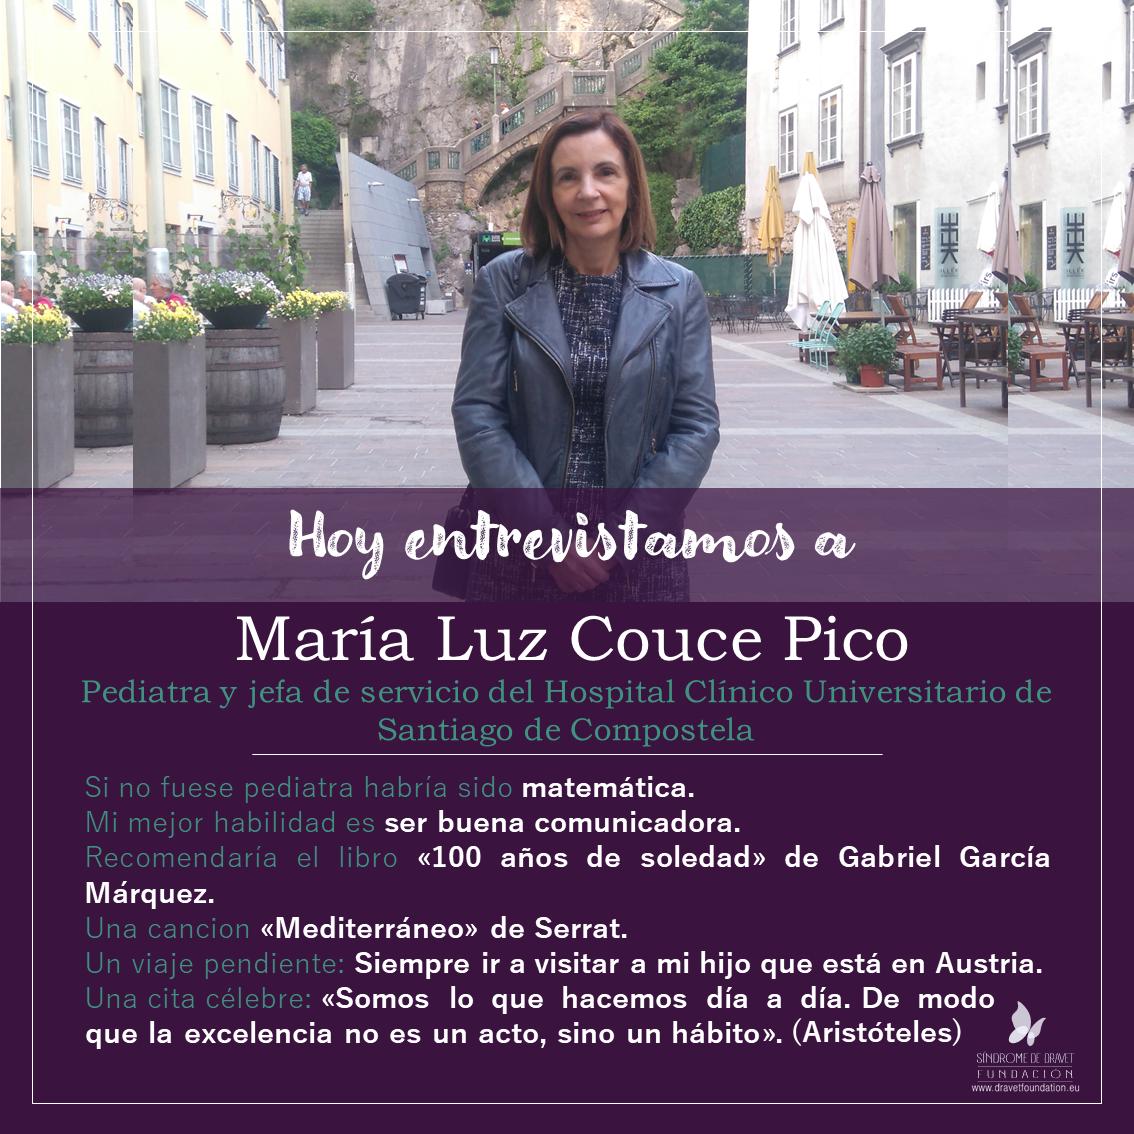 Entrevistamos a María Luz Couce Pico